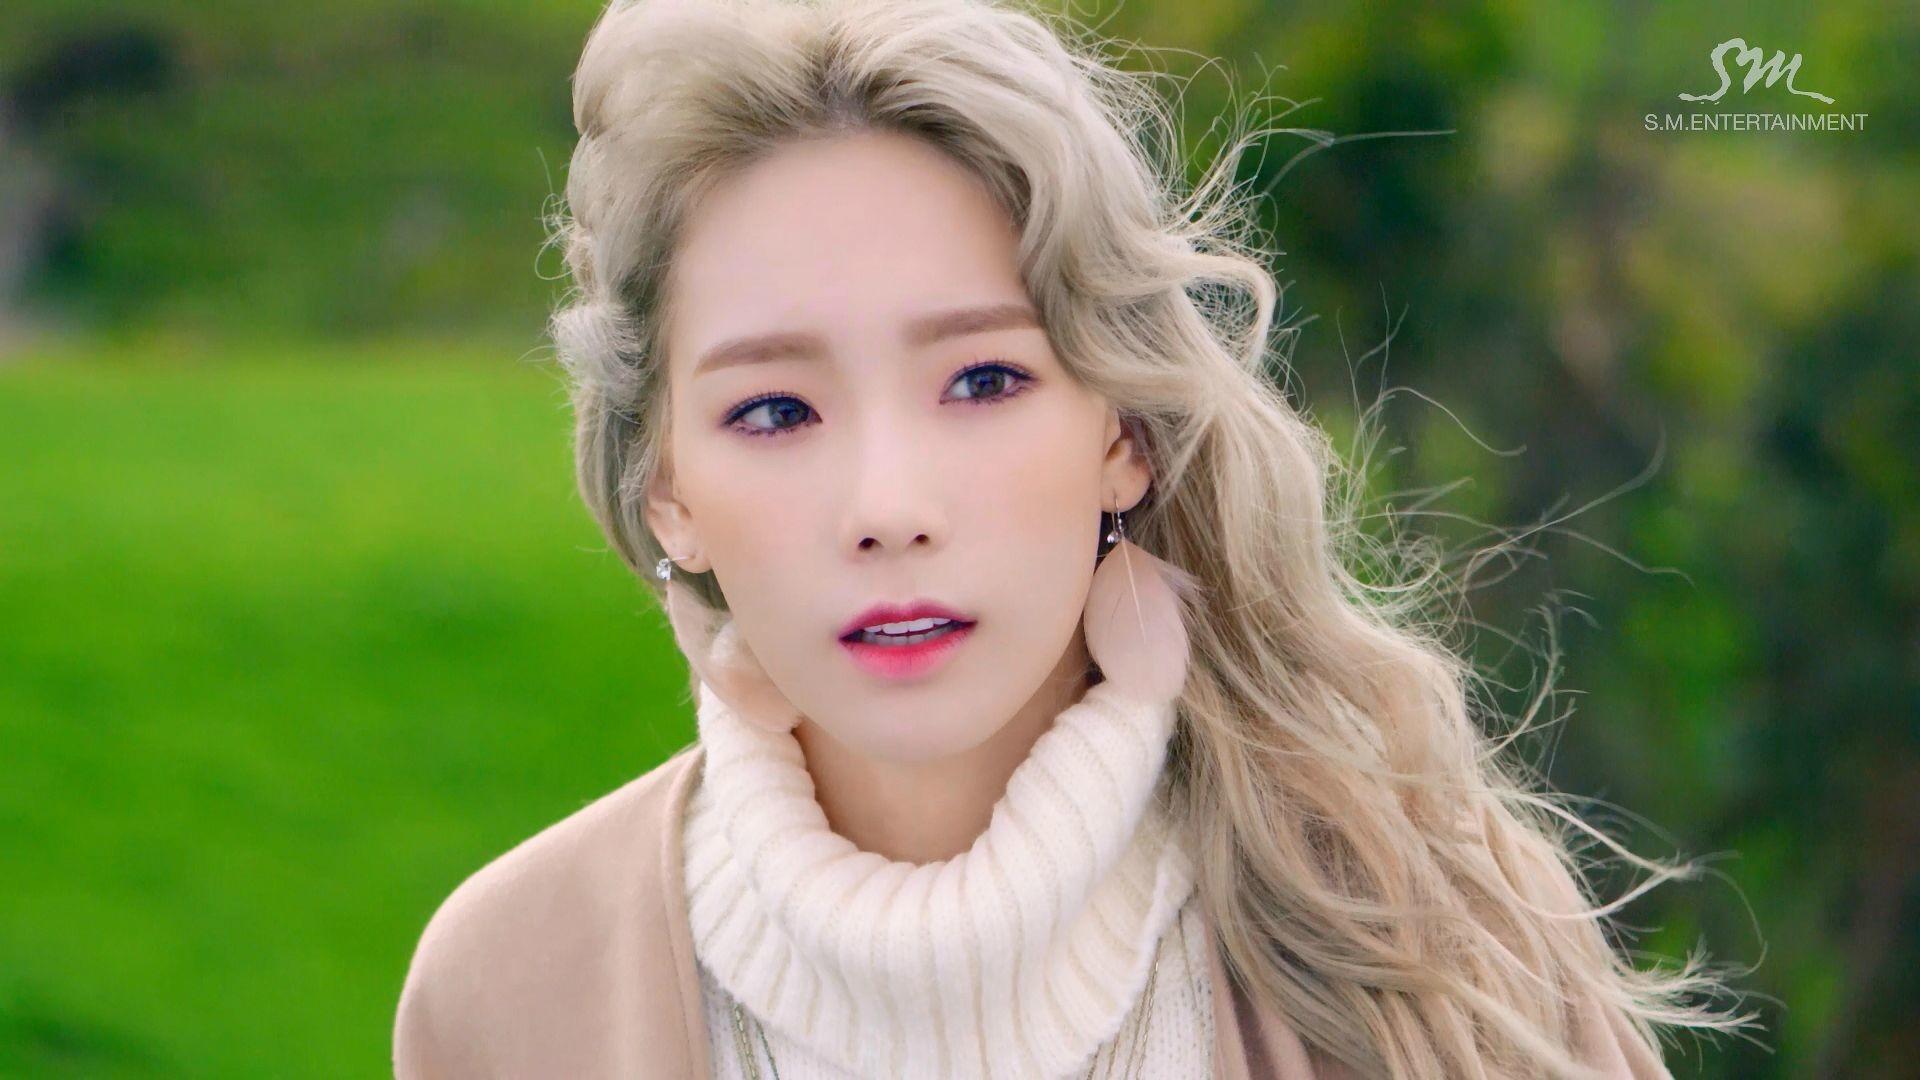 [MV] Taeyeon – I (feat. Verbal Jint) [Bugs! HD 1080p]